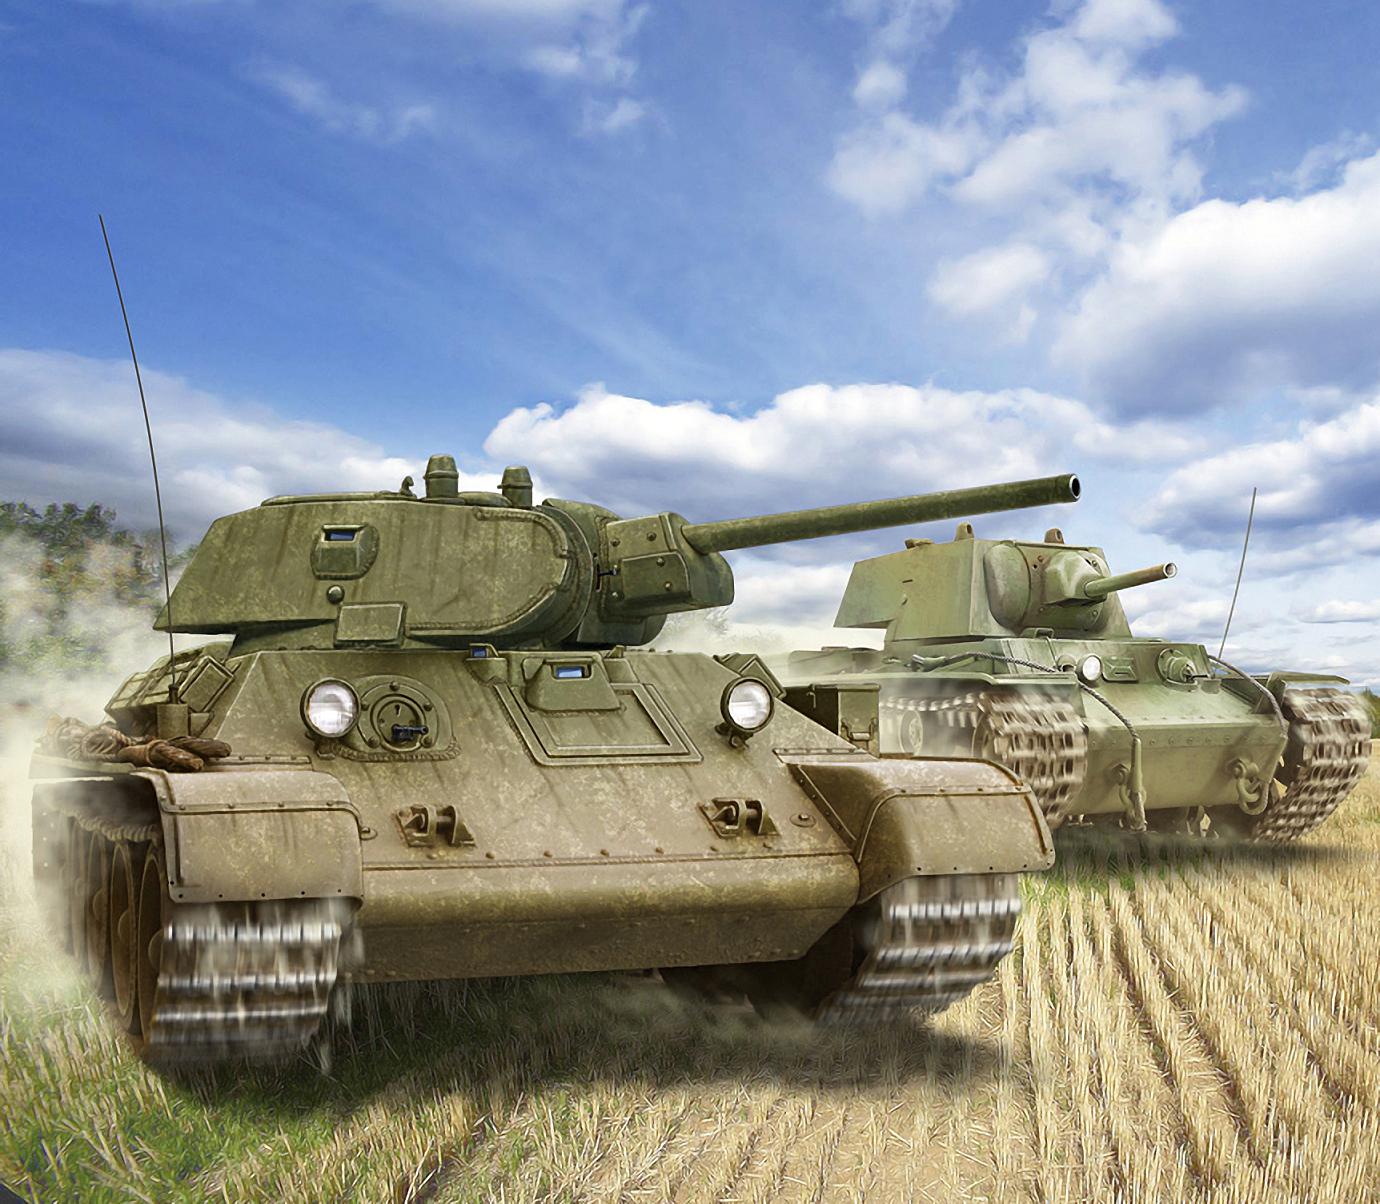 Петелин Валерий. Танки Т-34/85 и КВ-1.